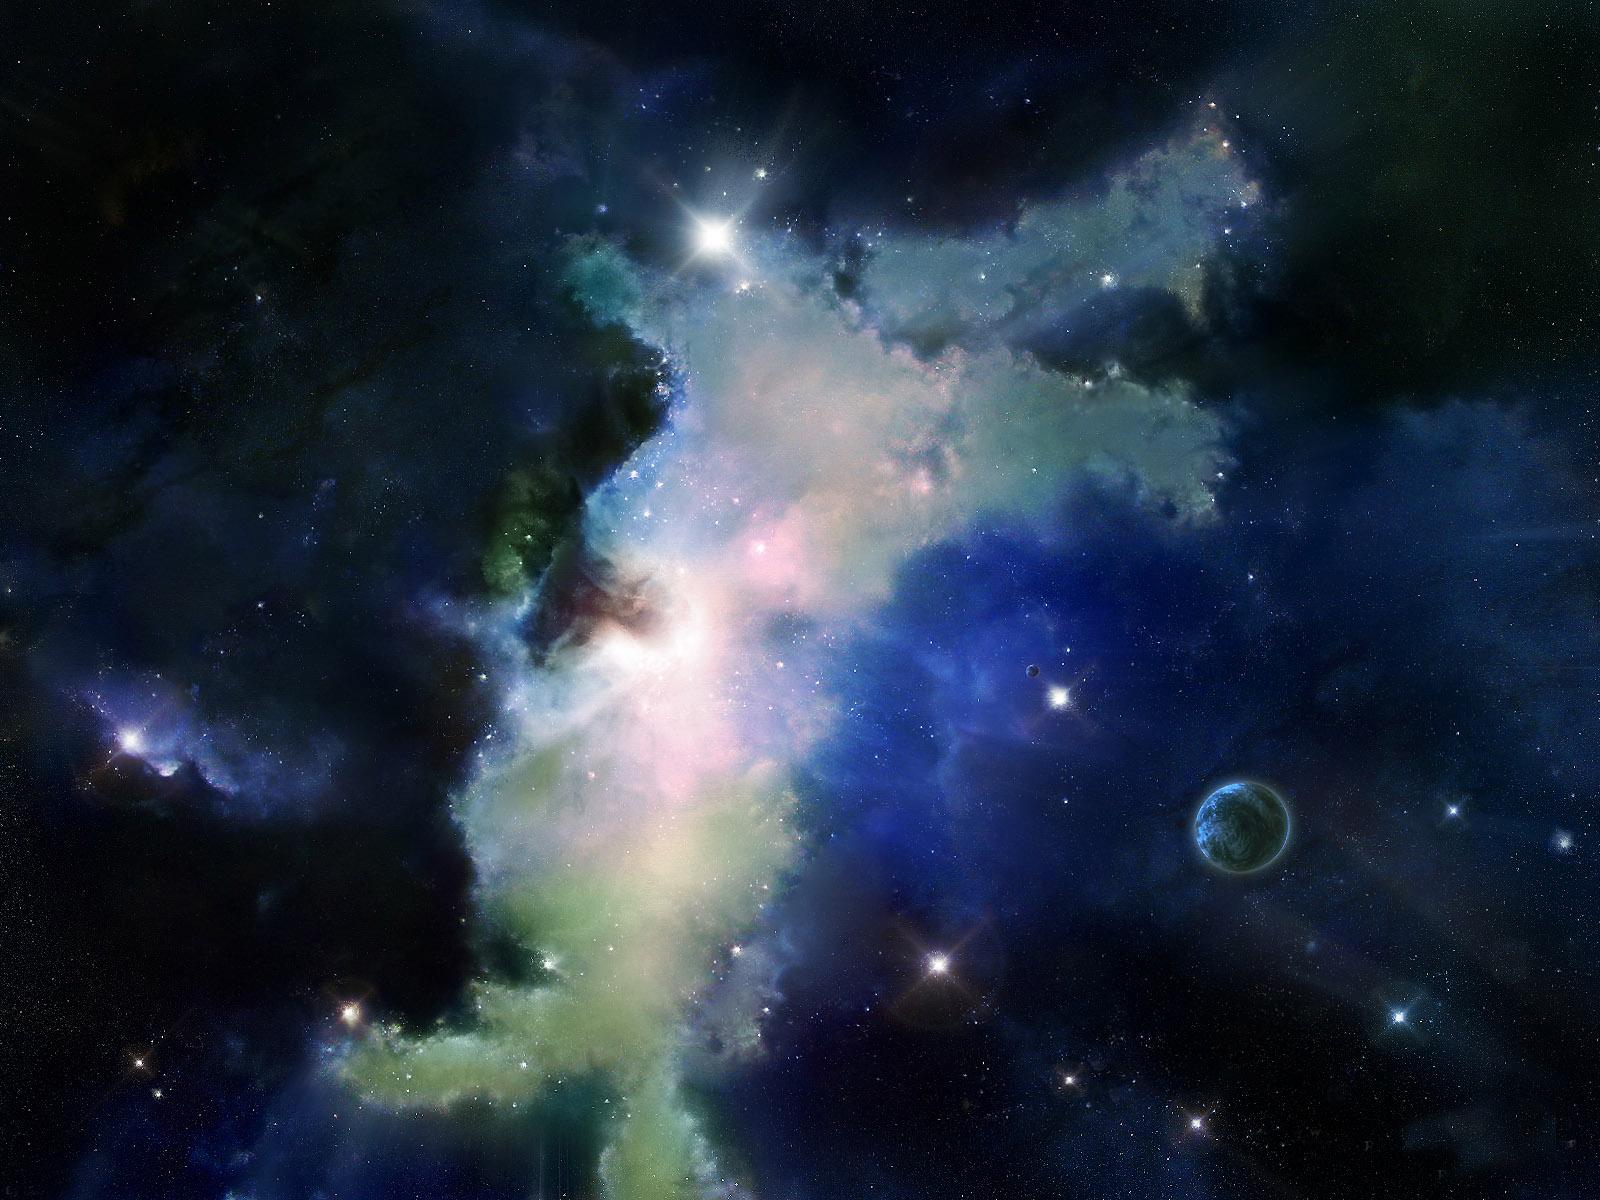 http://4.bp.blogspot.com/_7pv0LpGTI1Y/TM8QKfZ5maI/AAAAAAAAB-U/dVxqeYMsscI/s1600/Space+Art+Wallpapers+16.jpg